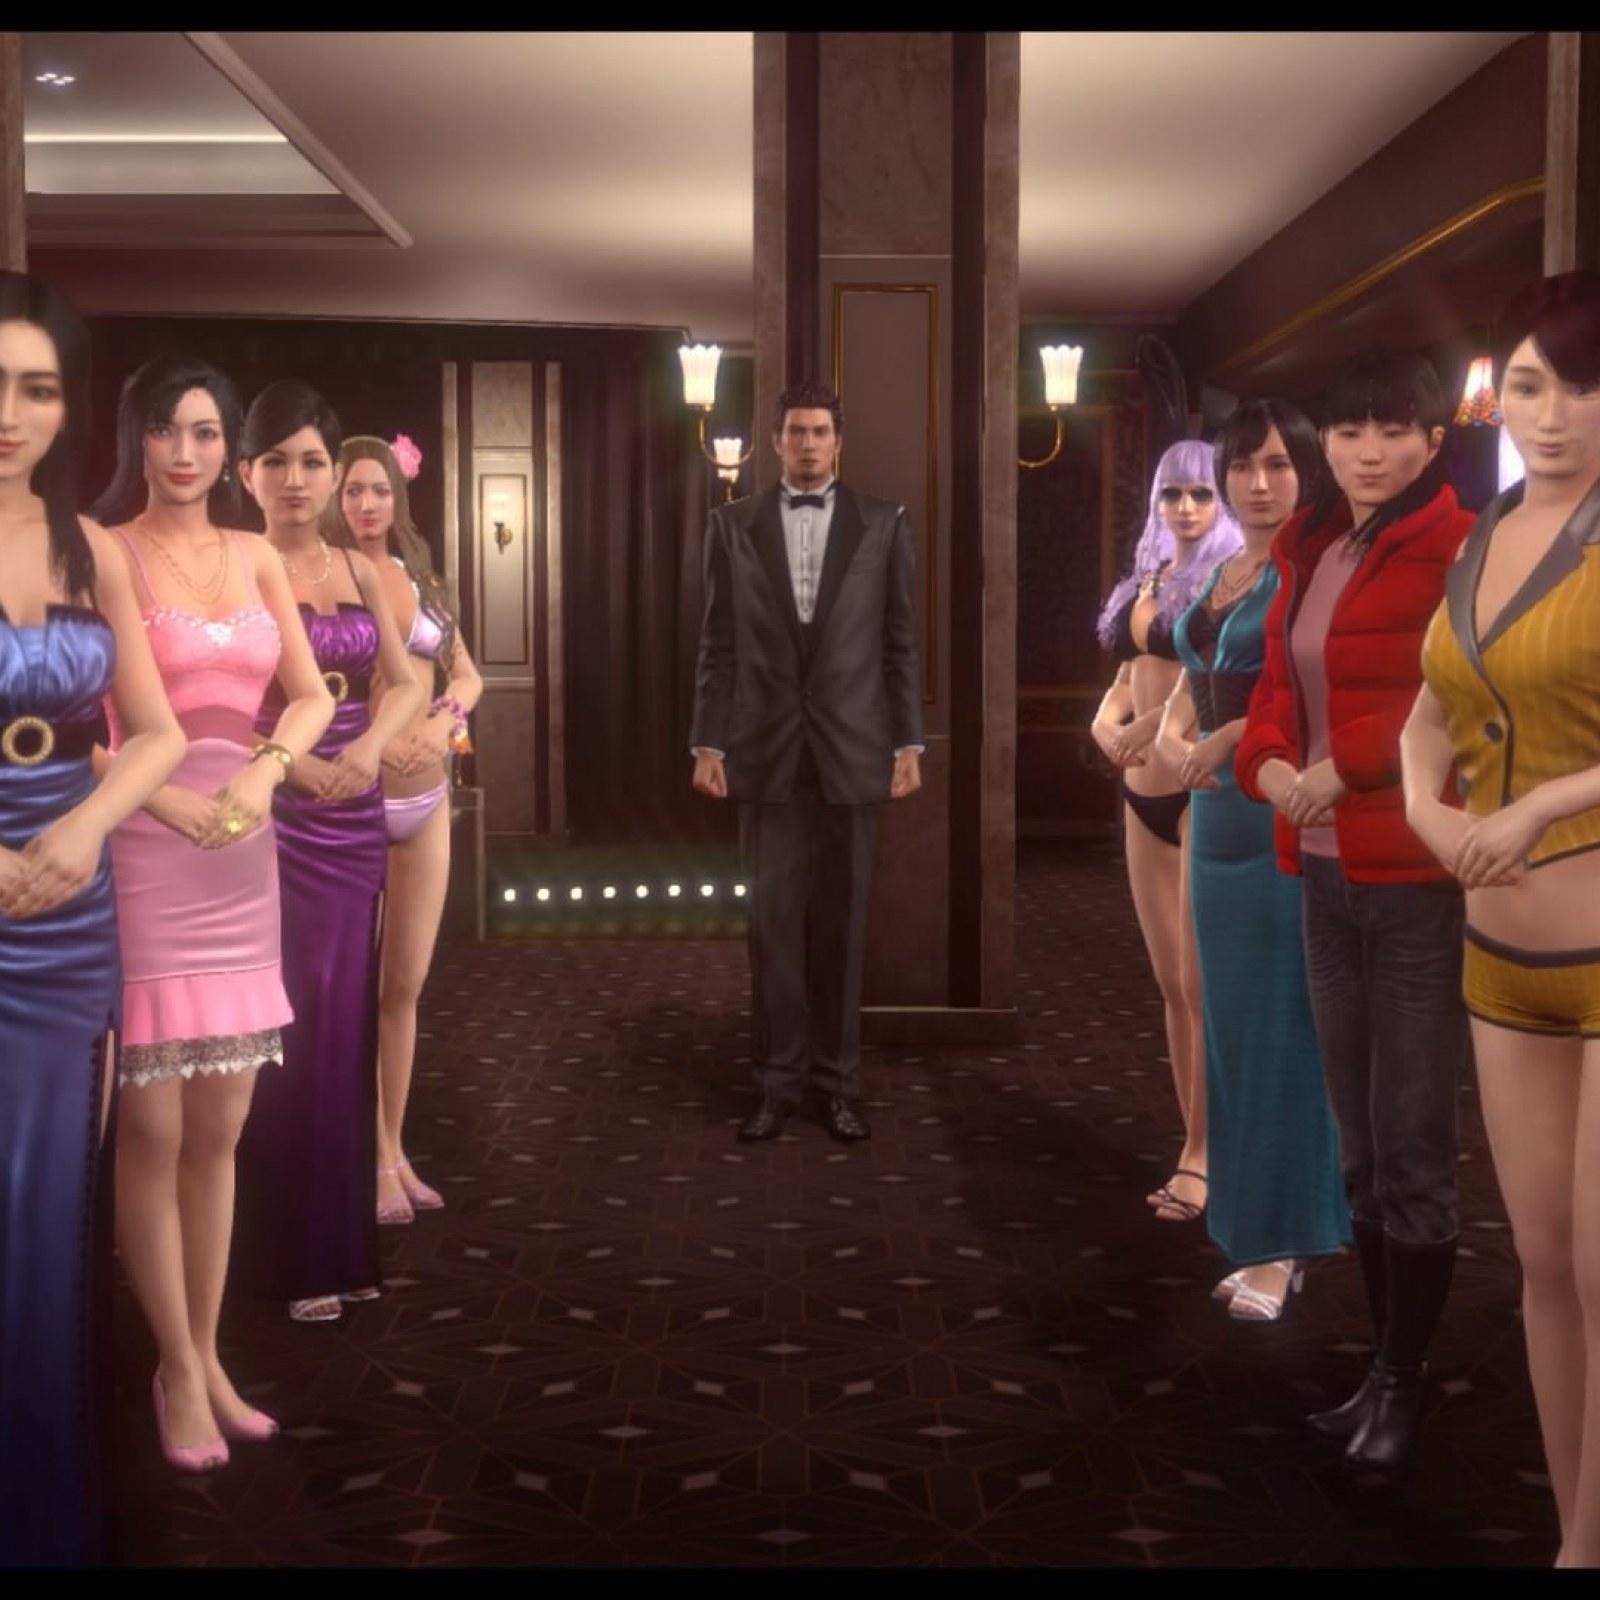 Yakuza 4 Hostess Guide - Yakuza 0 Dating Guide Vkontakte